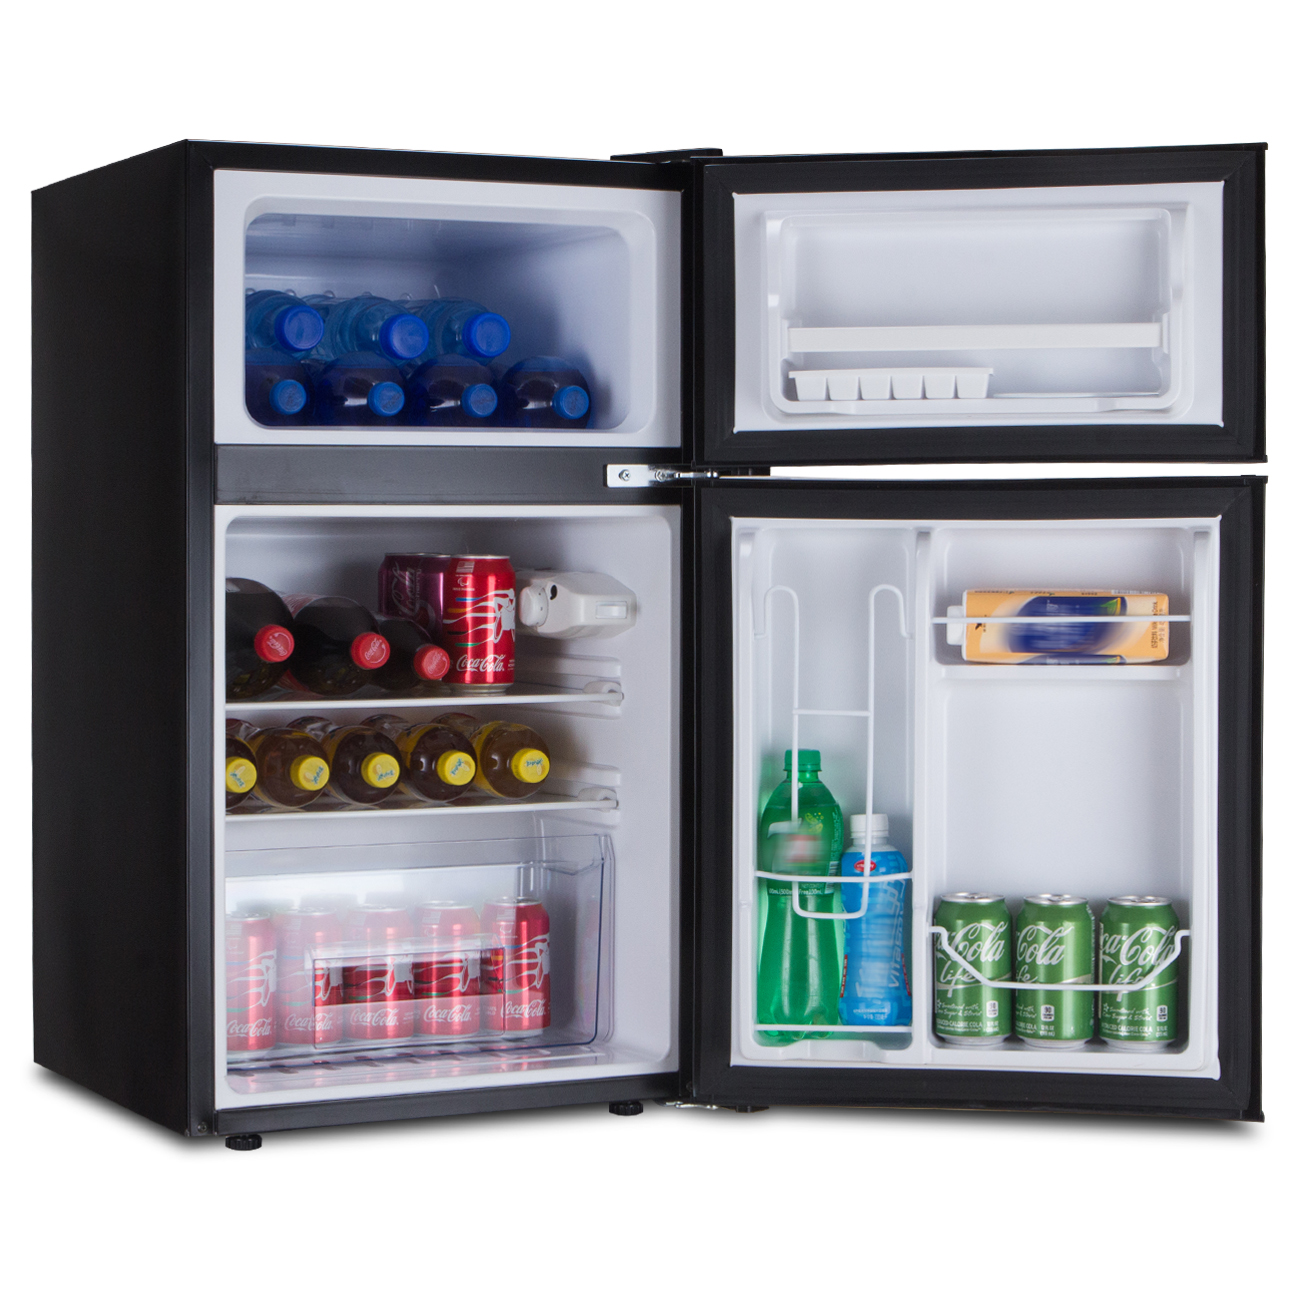 2 Door Mini Dorm Upright Compact Refrigerator And Freezer Fridge